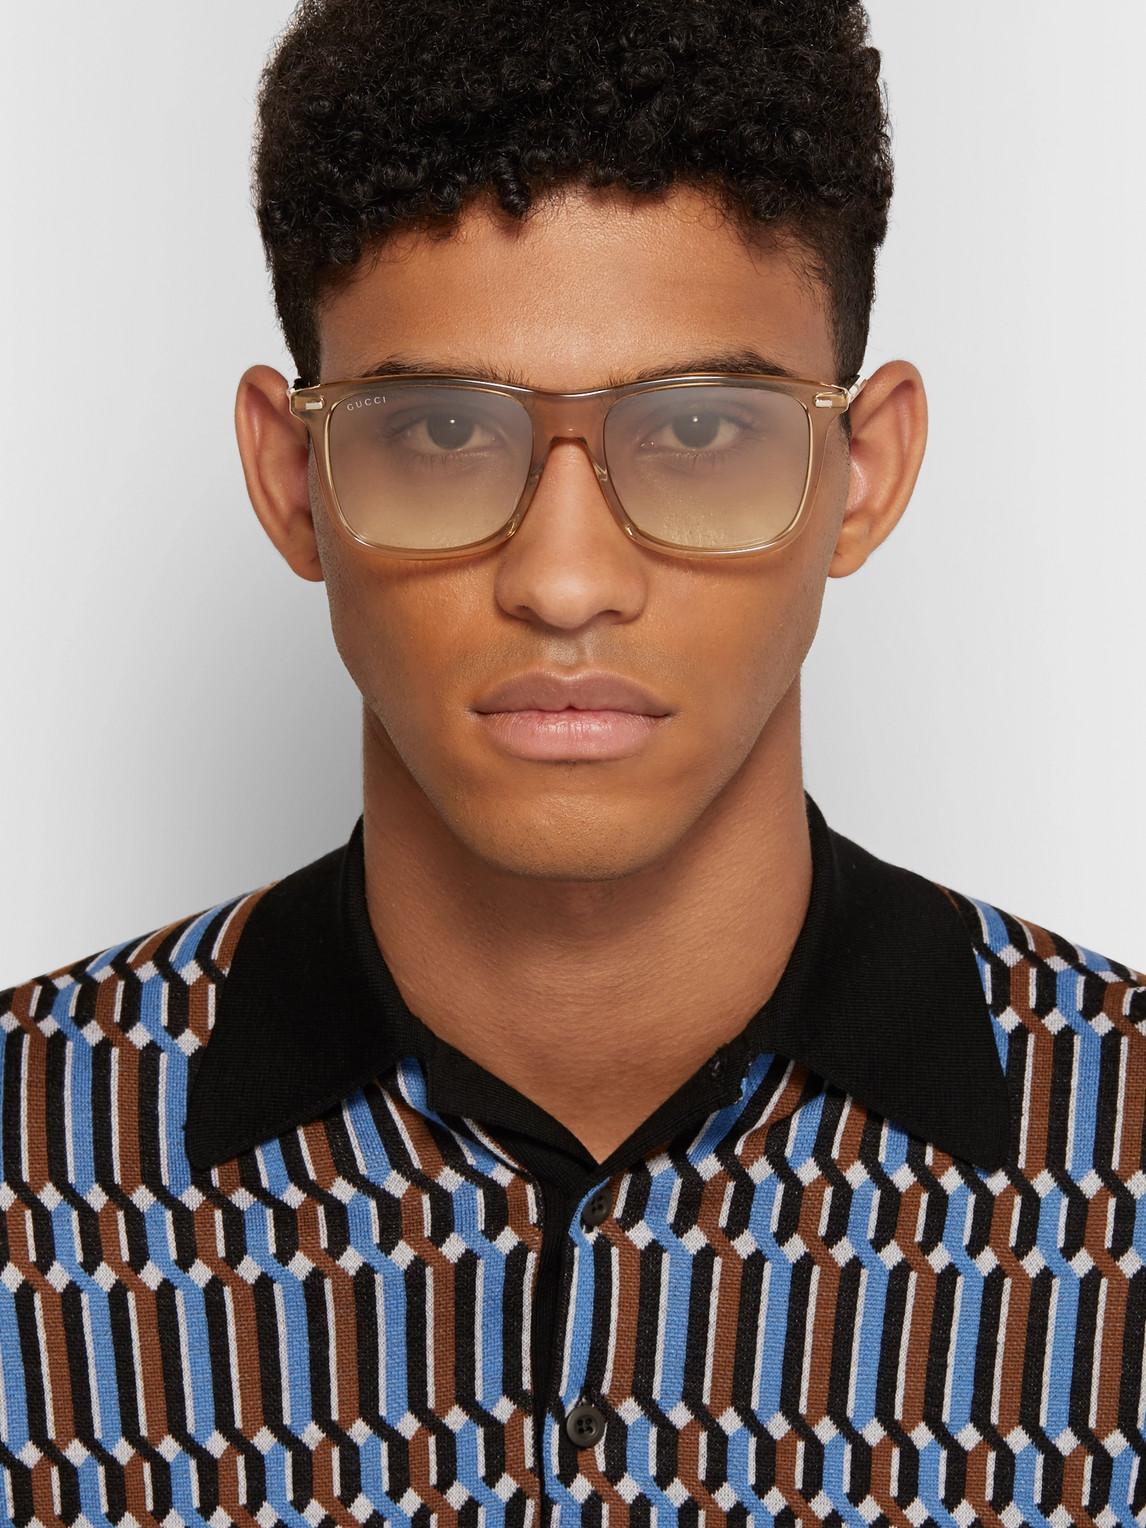 Gucci Sunglasses D-FRAME ACETATE AND GOLD-TONE SUNGLASSES